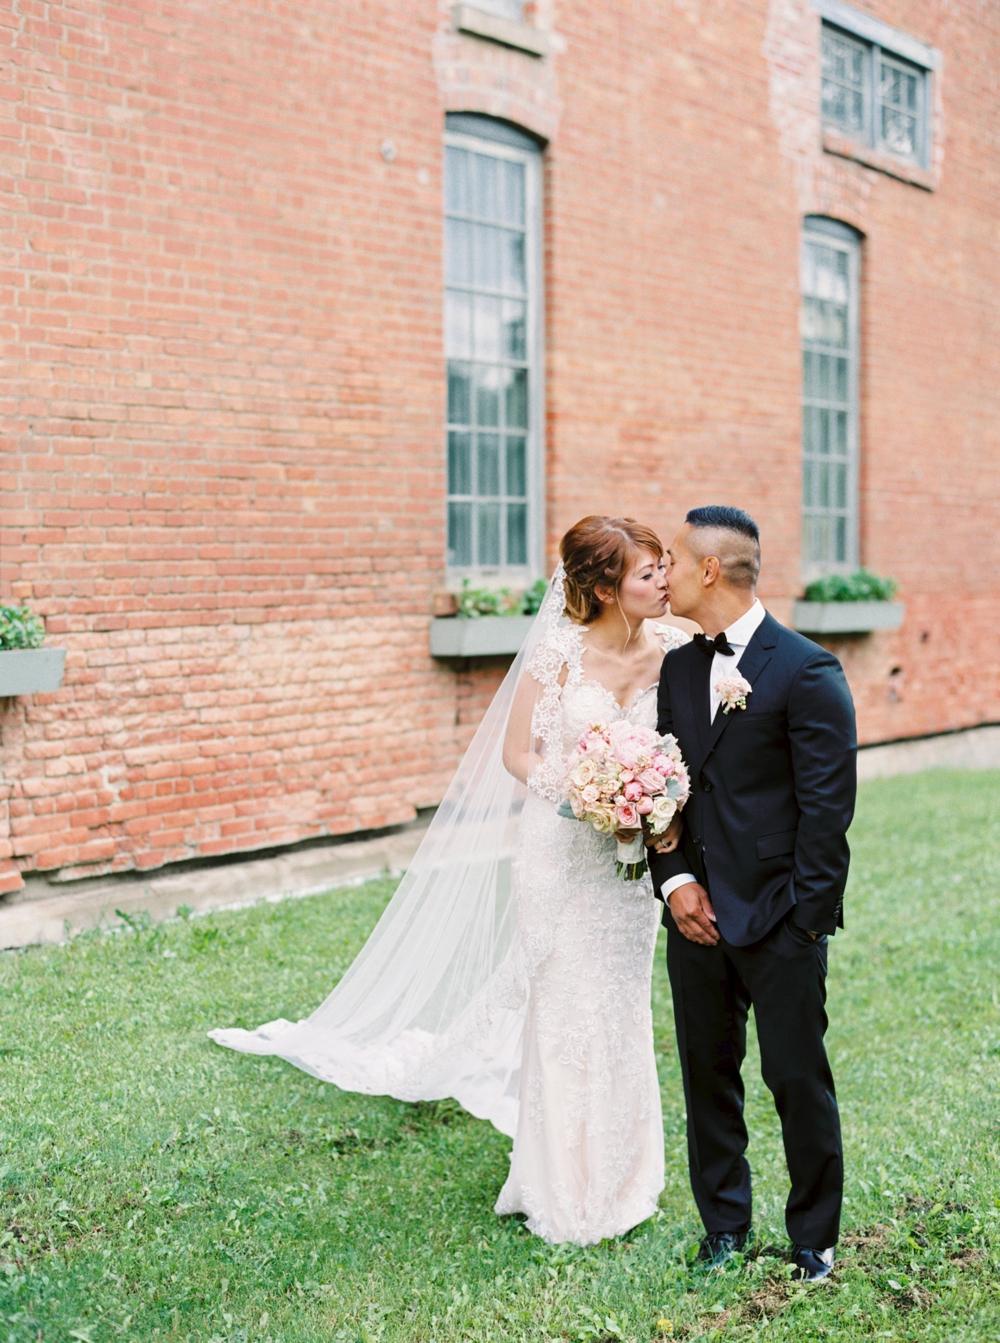 Calgary Wedding Photographer   Fairmont Hotel Macdonald Wedding   J'adore Weddings & Events Design   Edmonton Photography   Fine Art Film Wedding Photographer